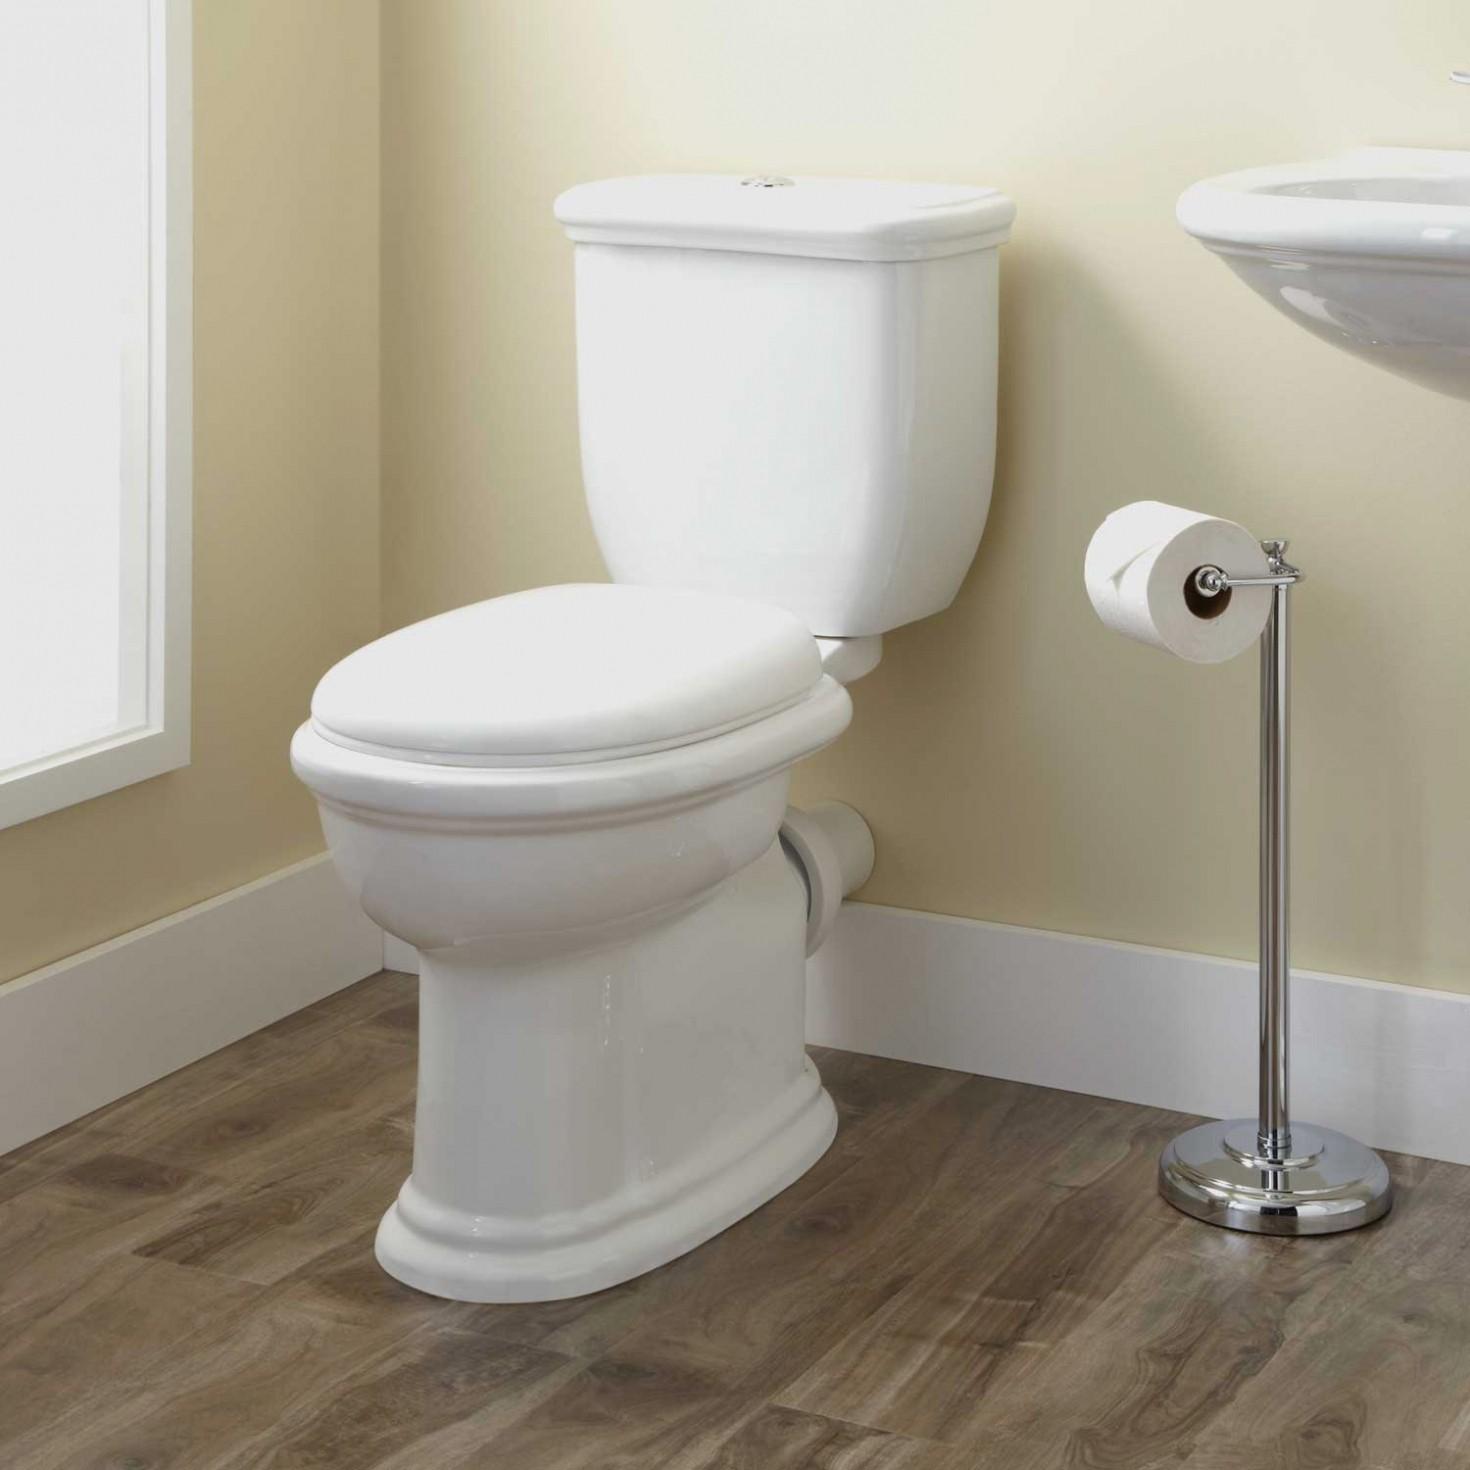 superb bathroom baseboard ideas model - bathroom design ideas